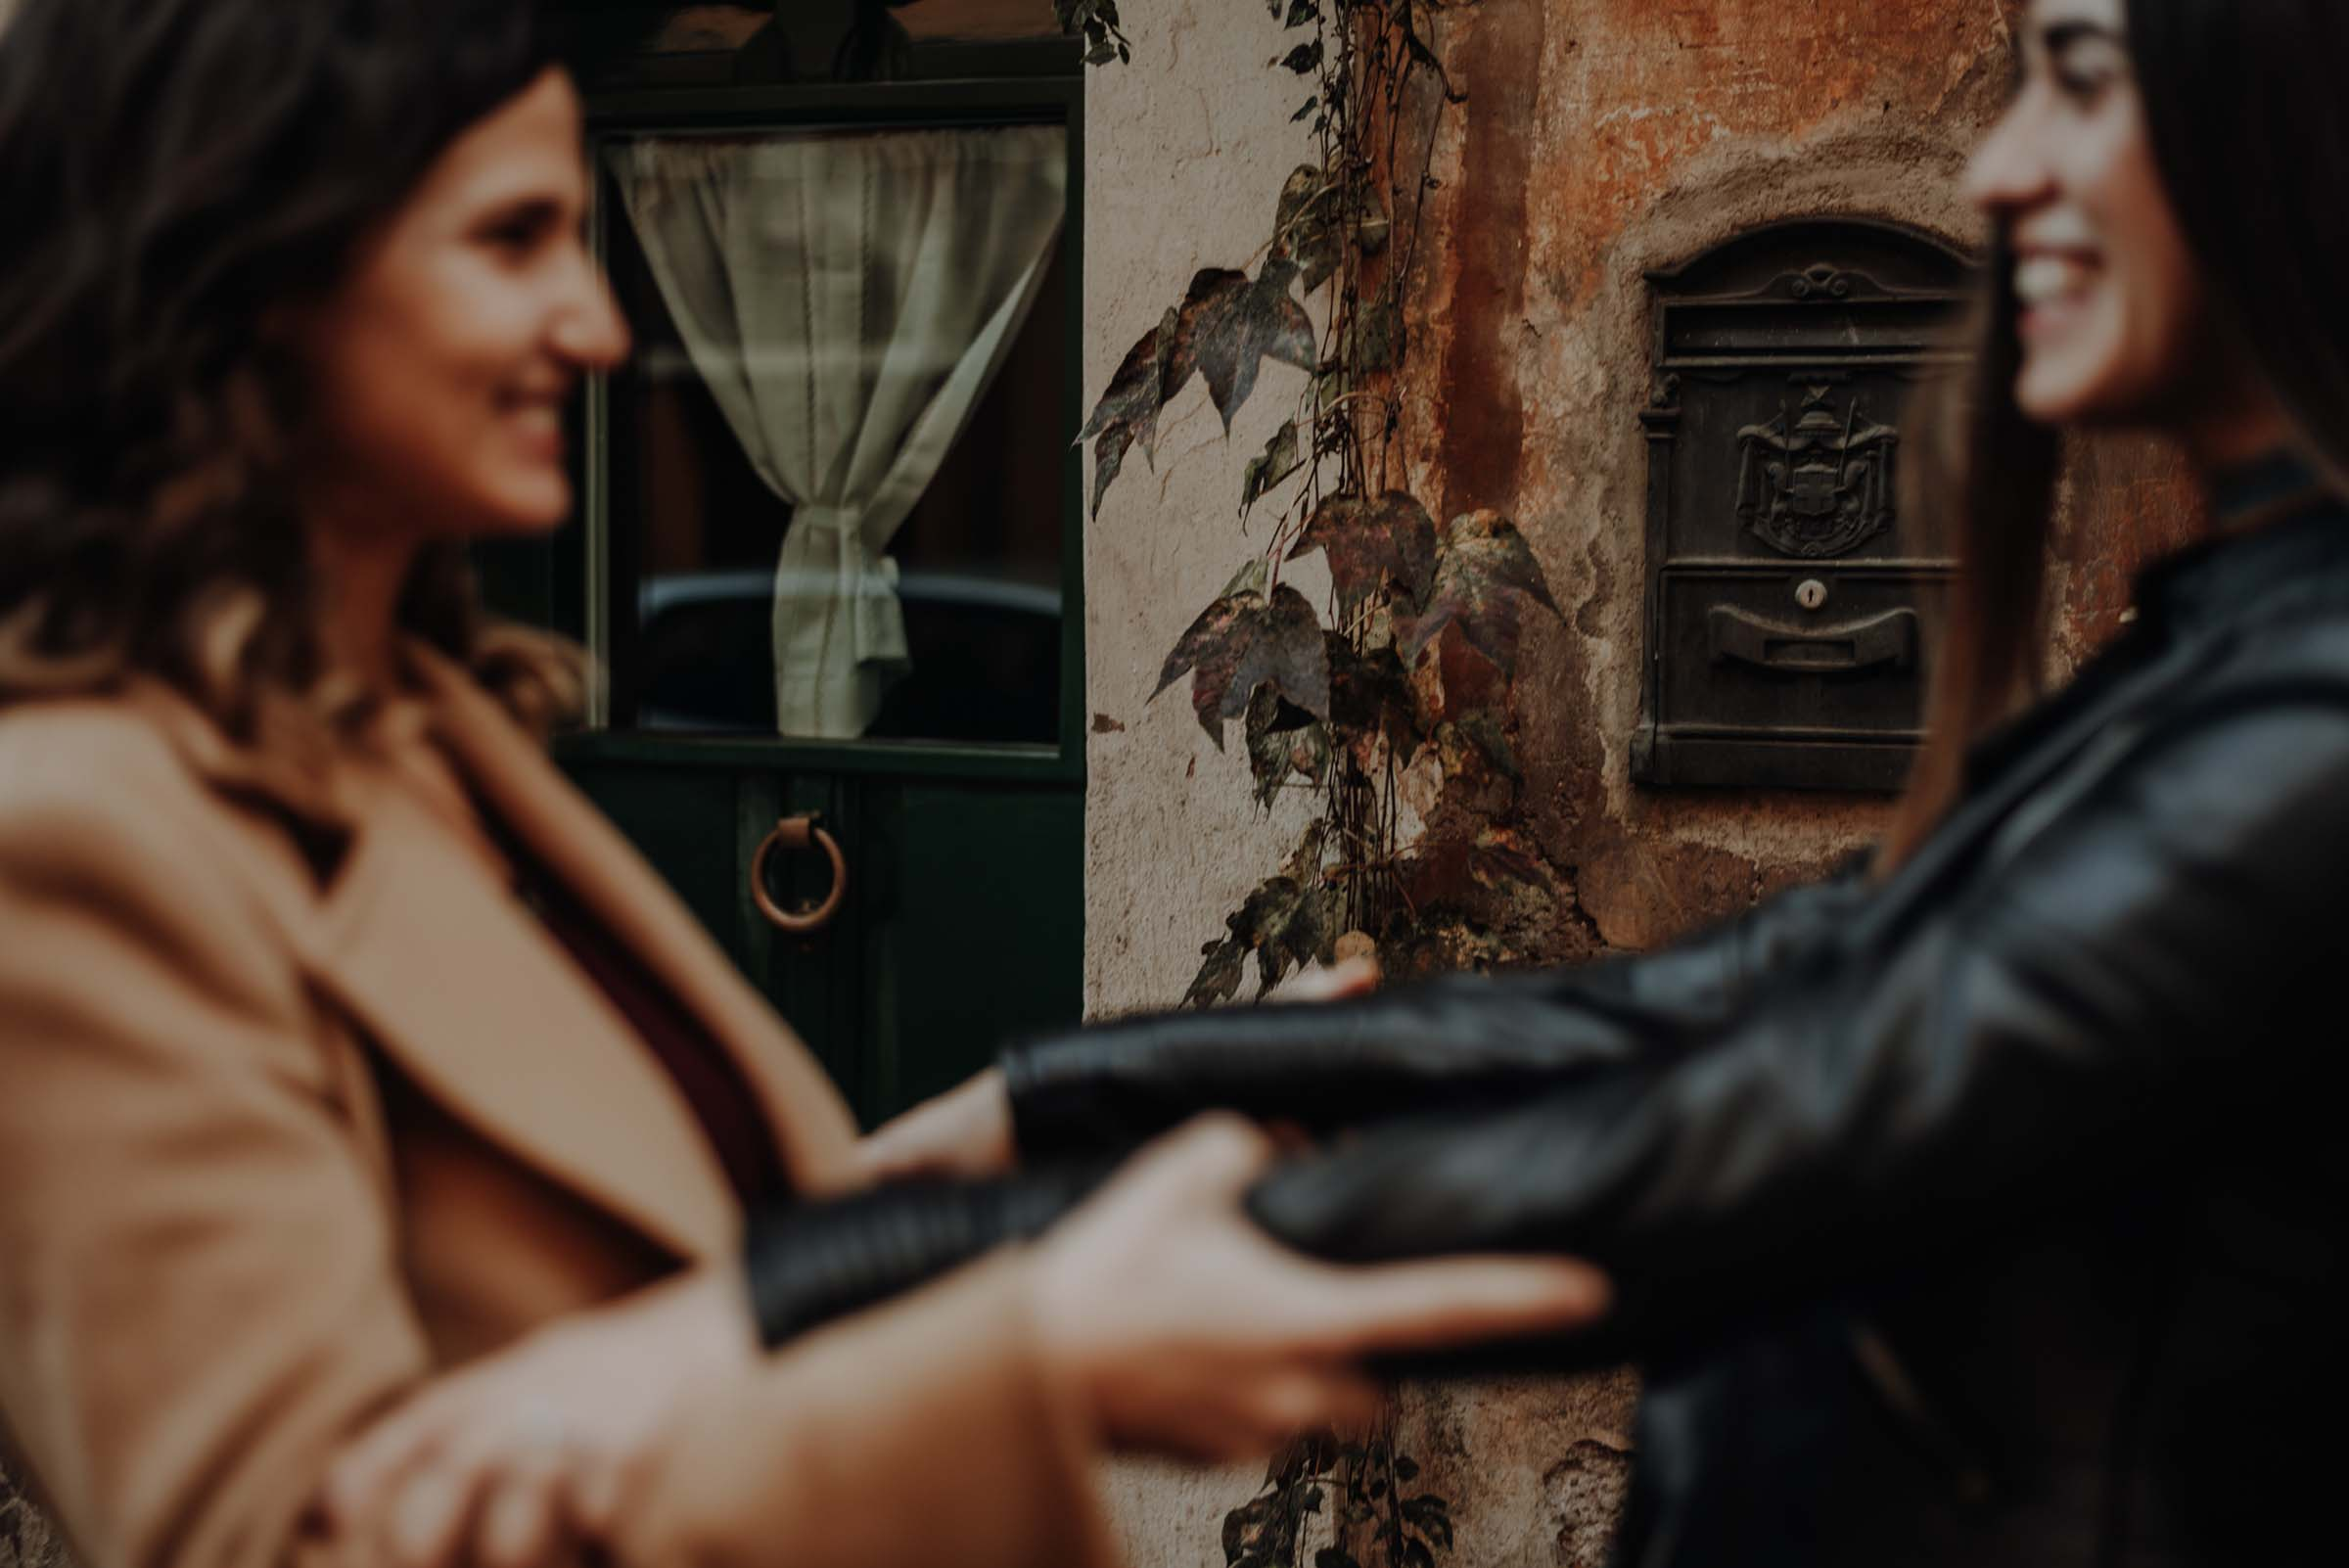 Rita Foldi photography lesbian gay same-sex couple Europe engagement proposal photos Dancing With Her wedding directory magazine